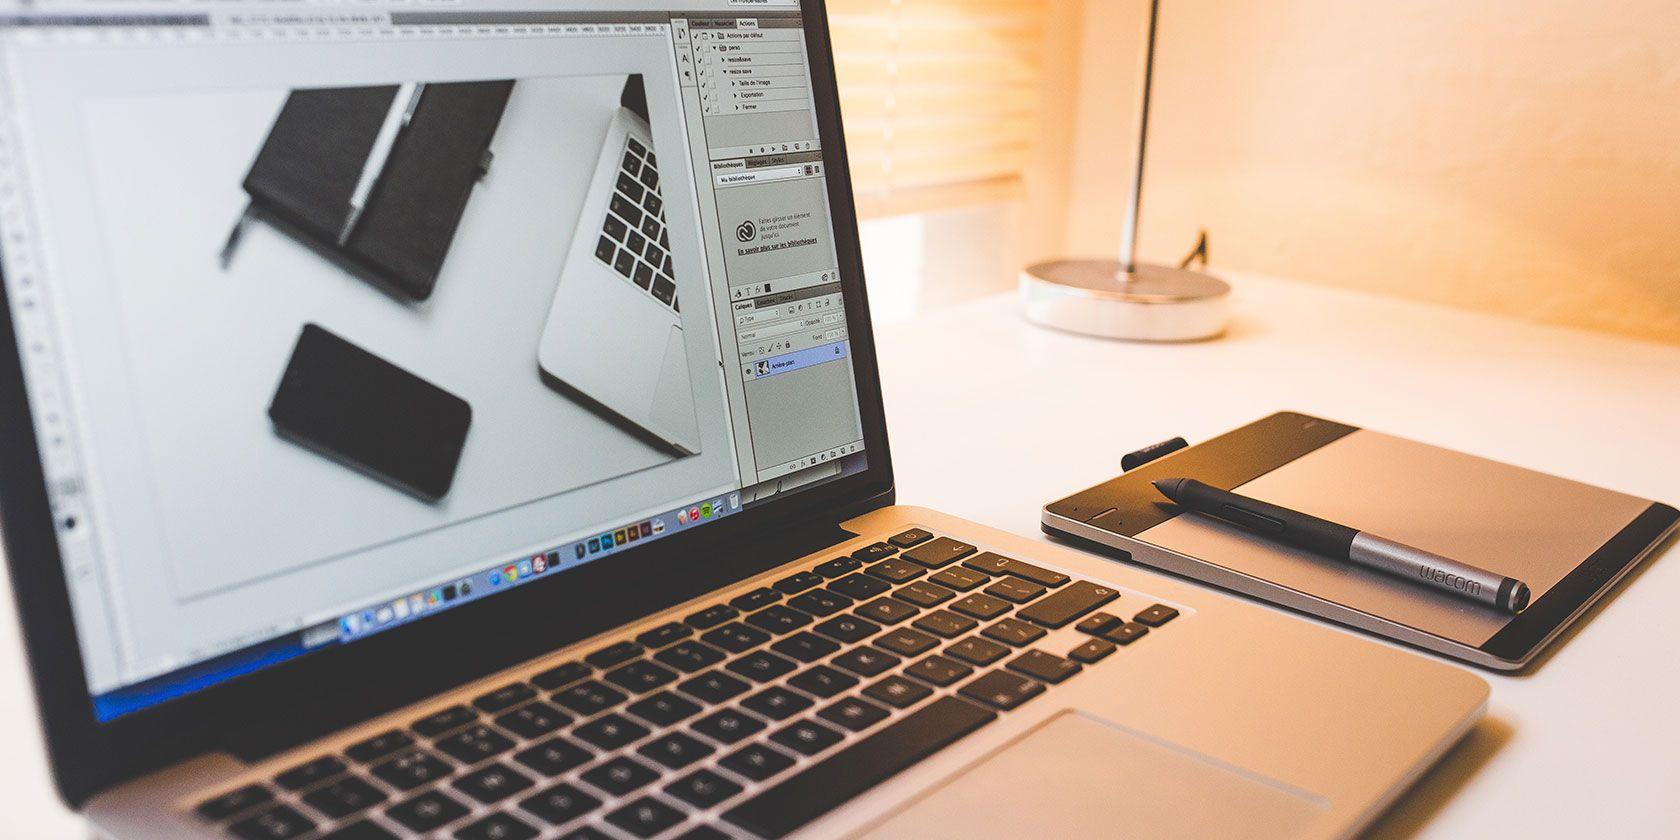 smart-objects-photoshop